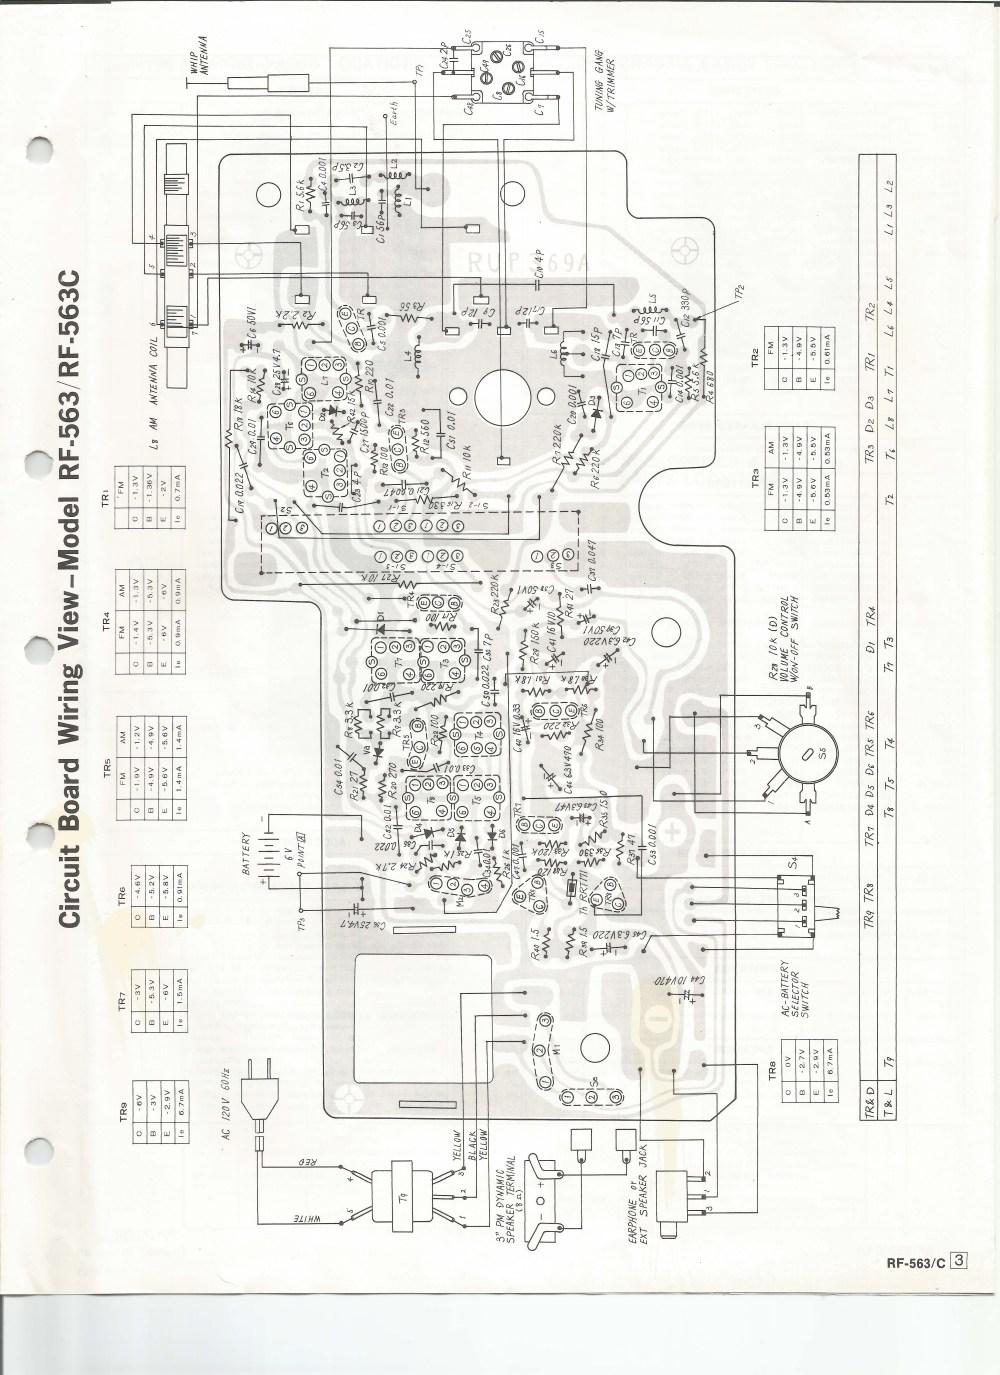 medium resolution of  radio schematic diagram panasonic rf 563 am fm radioparts layout